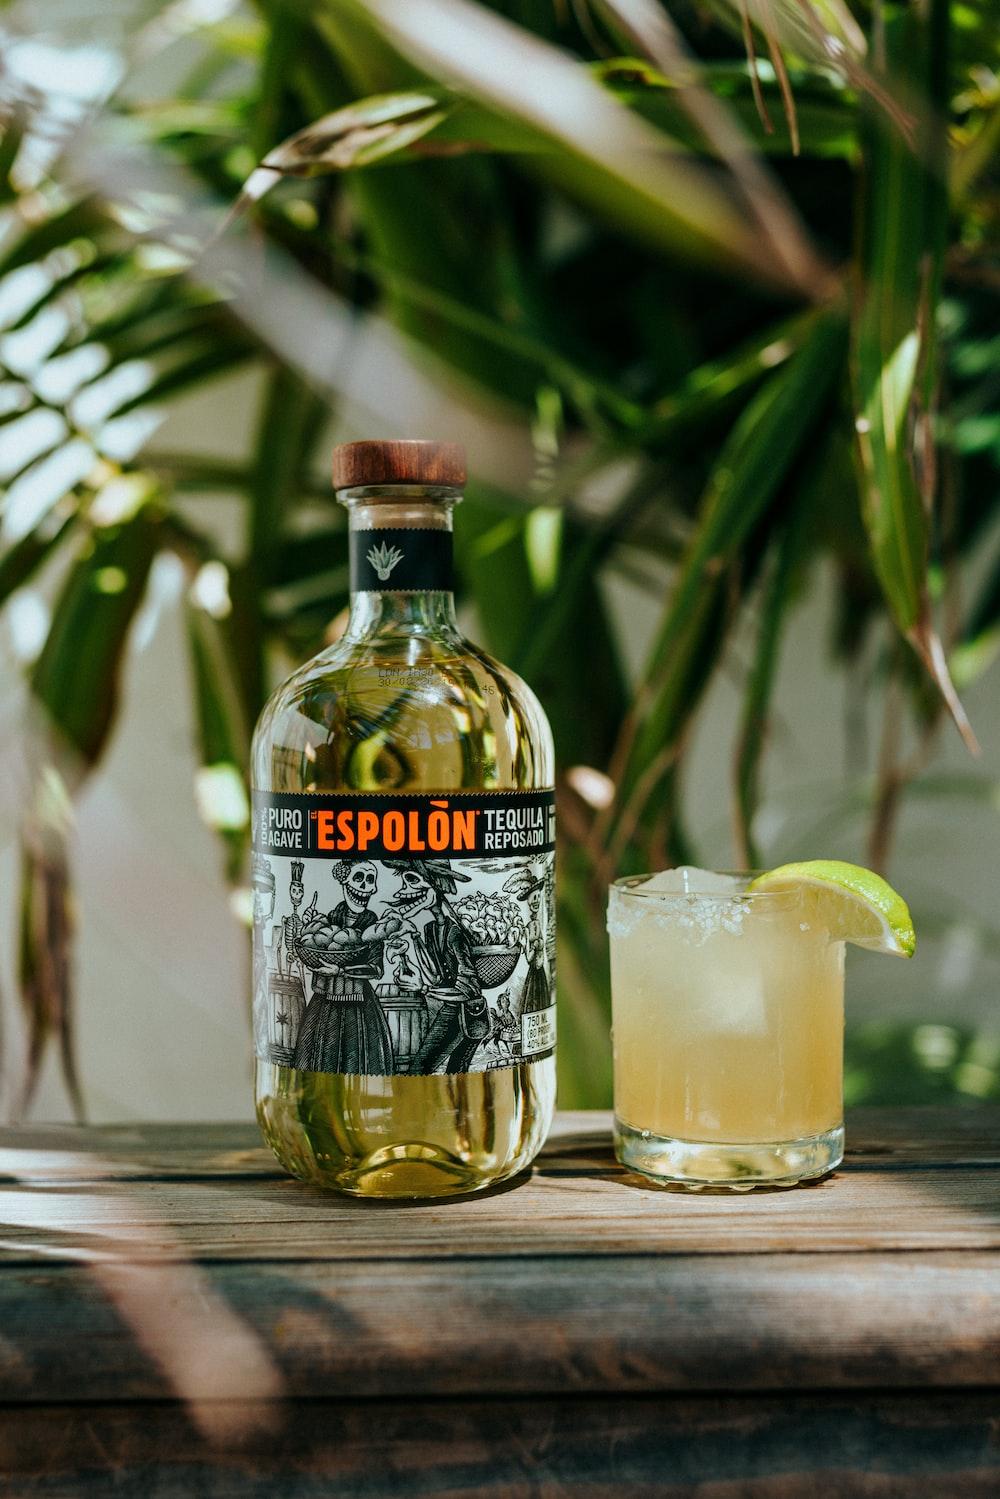 Espolòn Tequila bottle beside cocktail